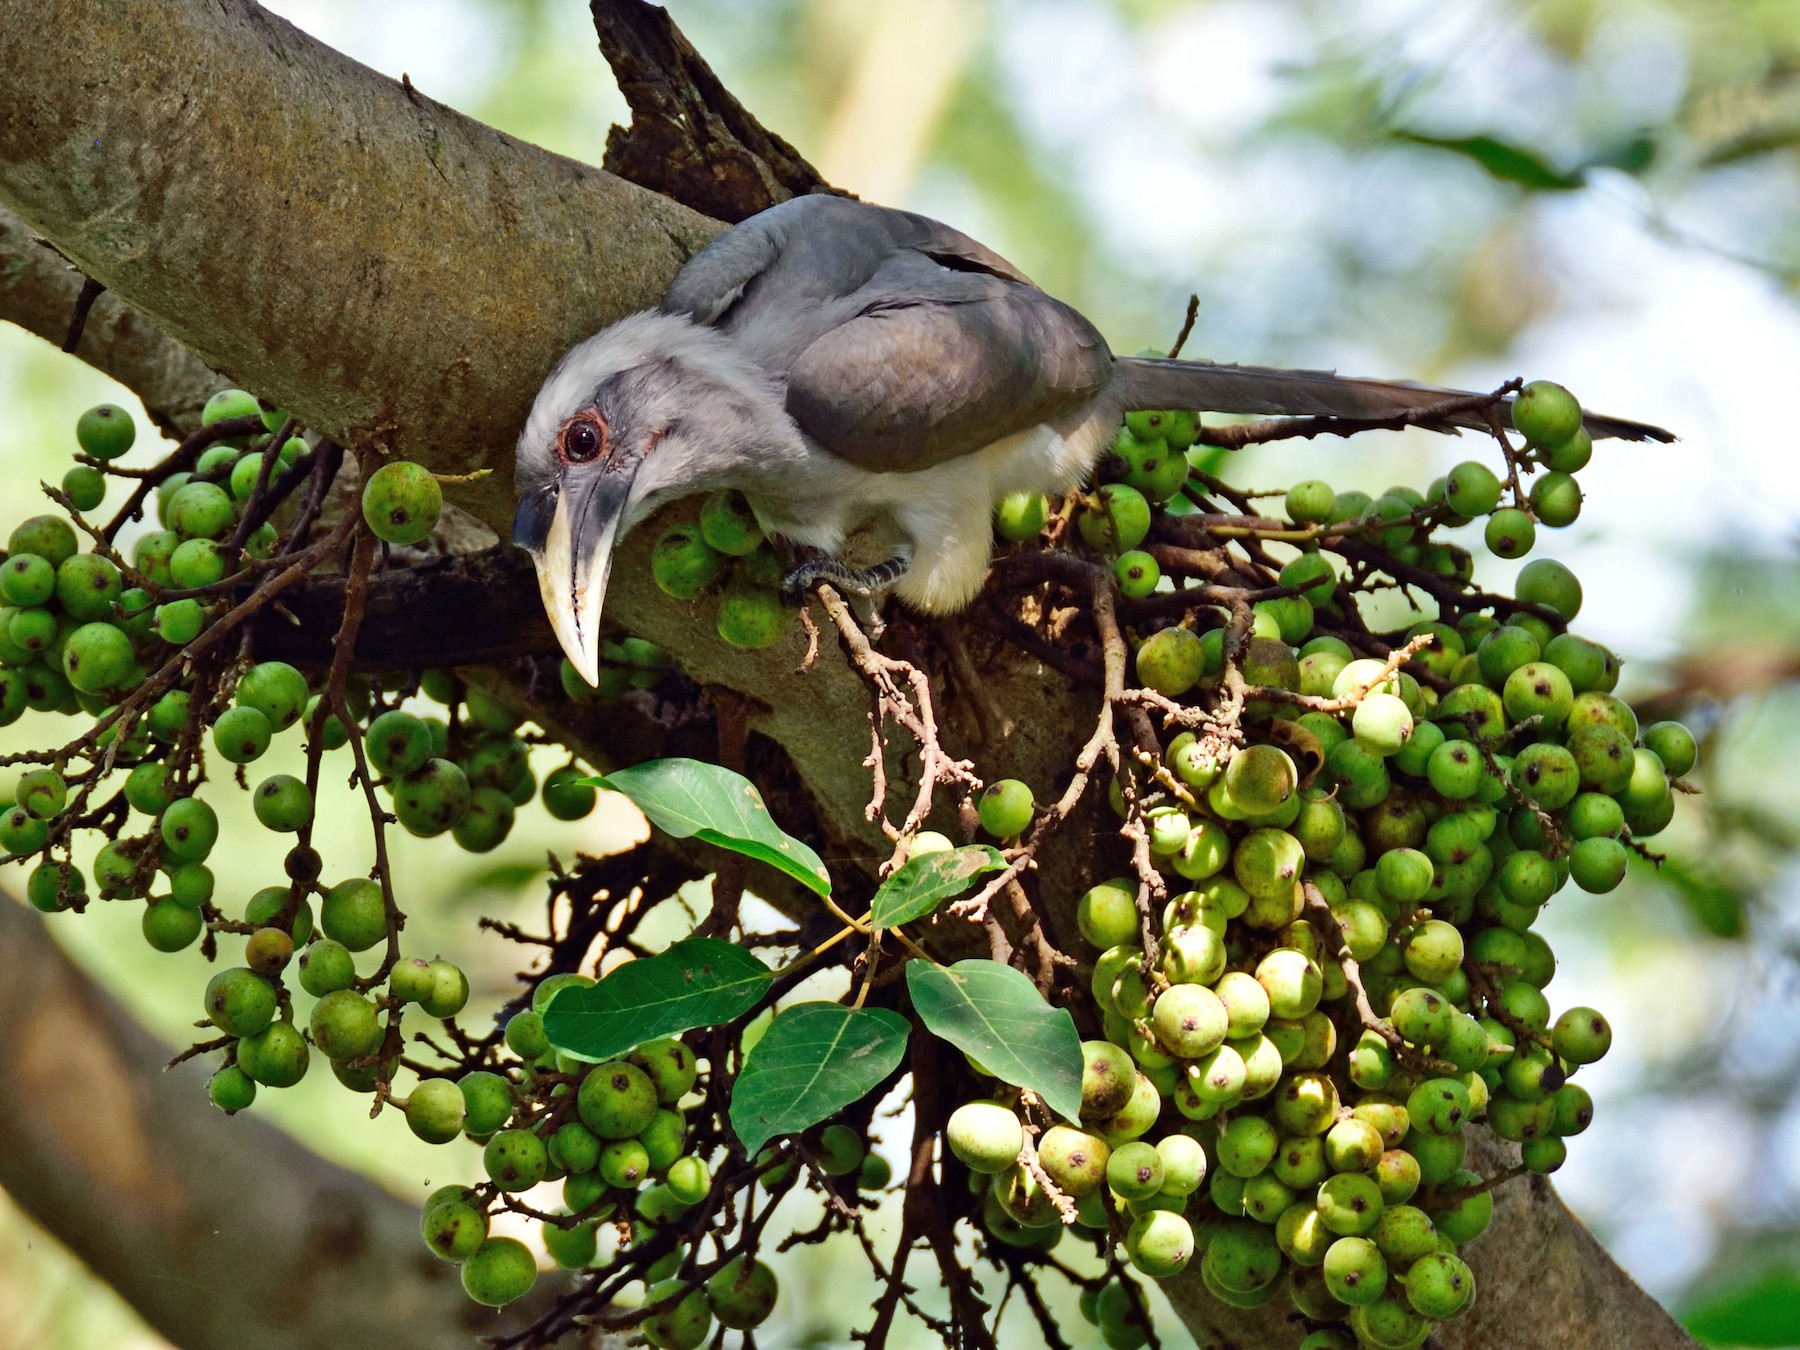 Indian Gray Hornbill - Prashobh Ailyam Nair